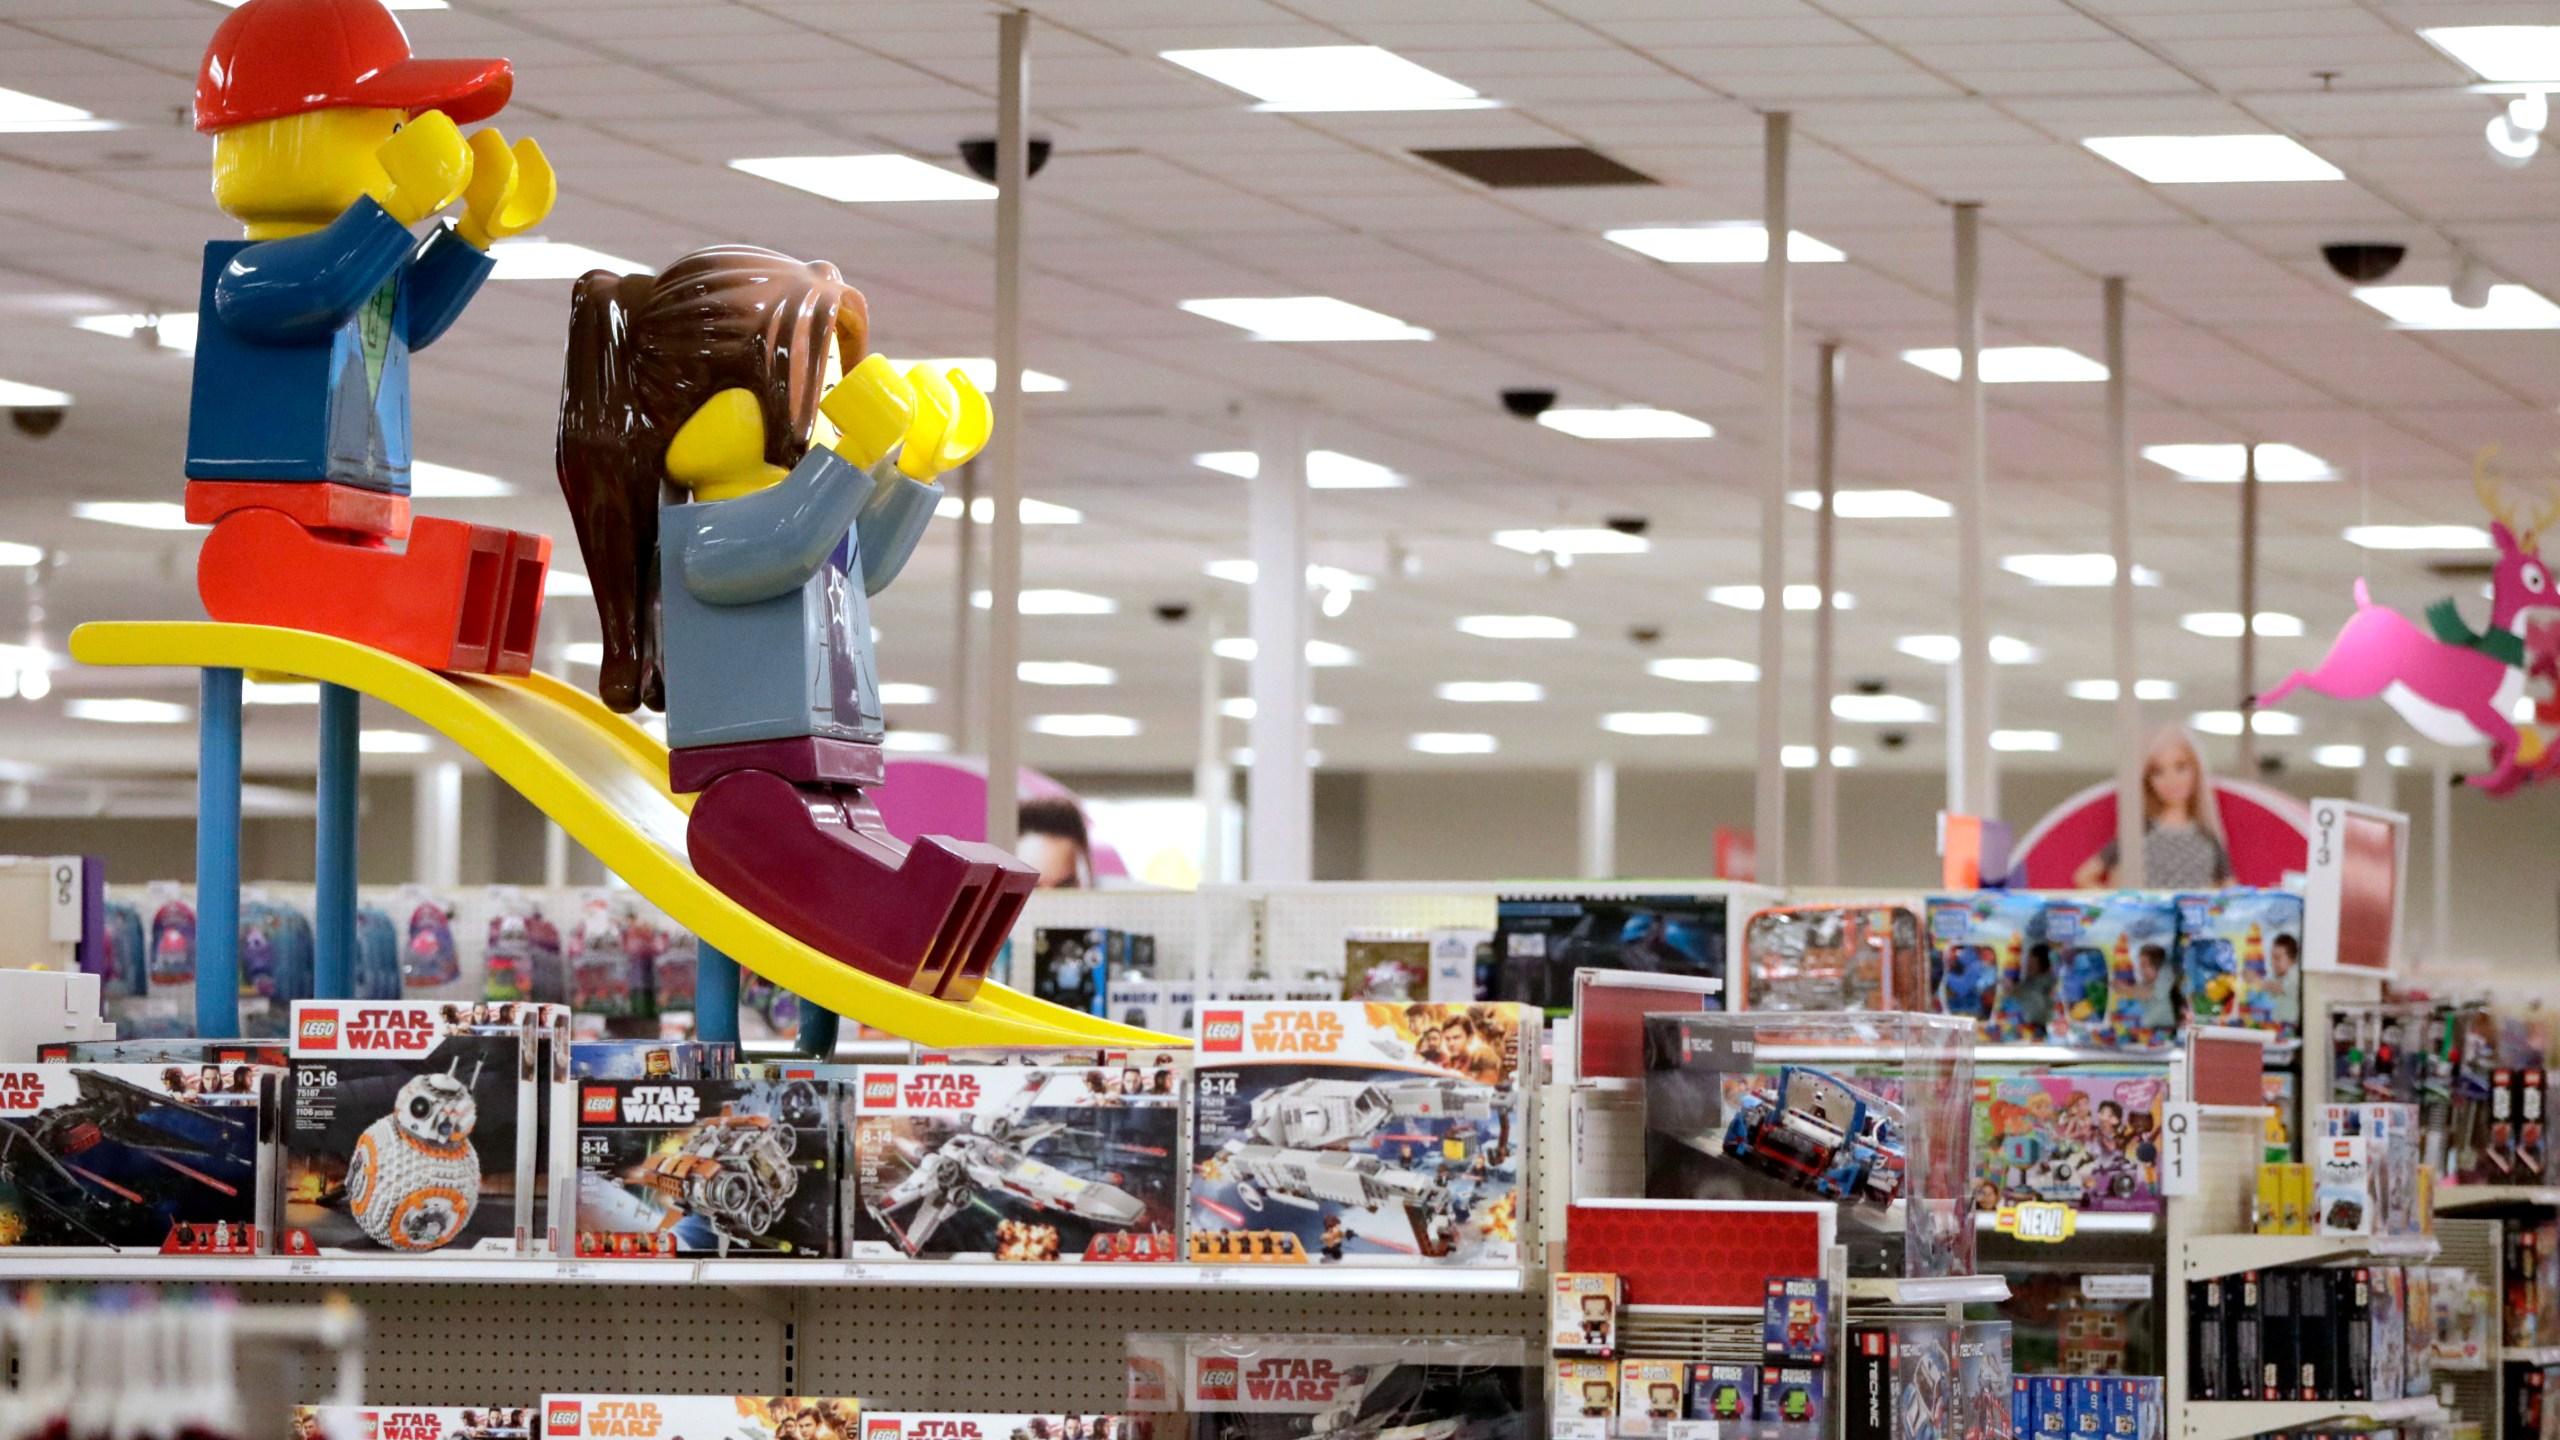 Dead_Retailers_Holiday_16745-159532.jpg49722266